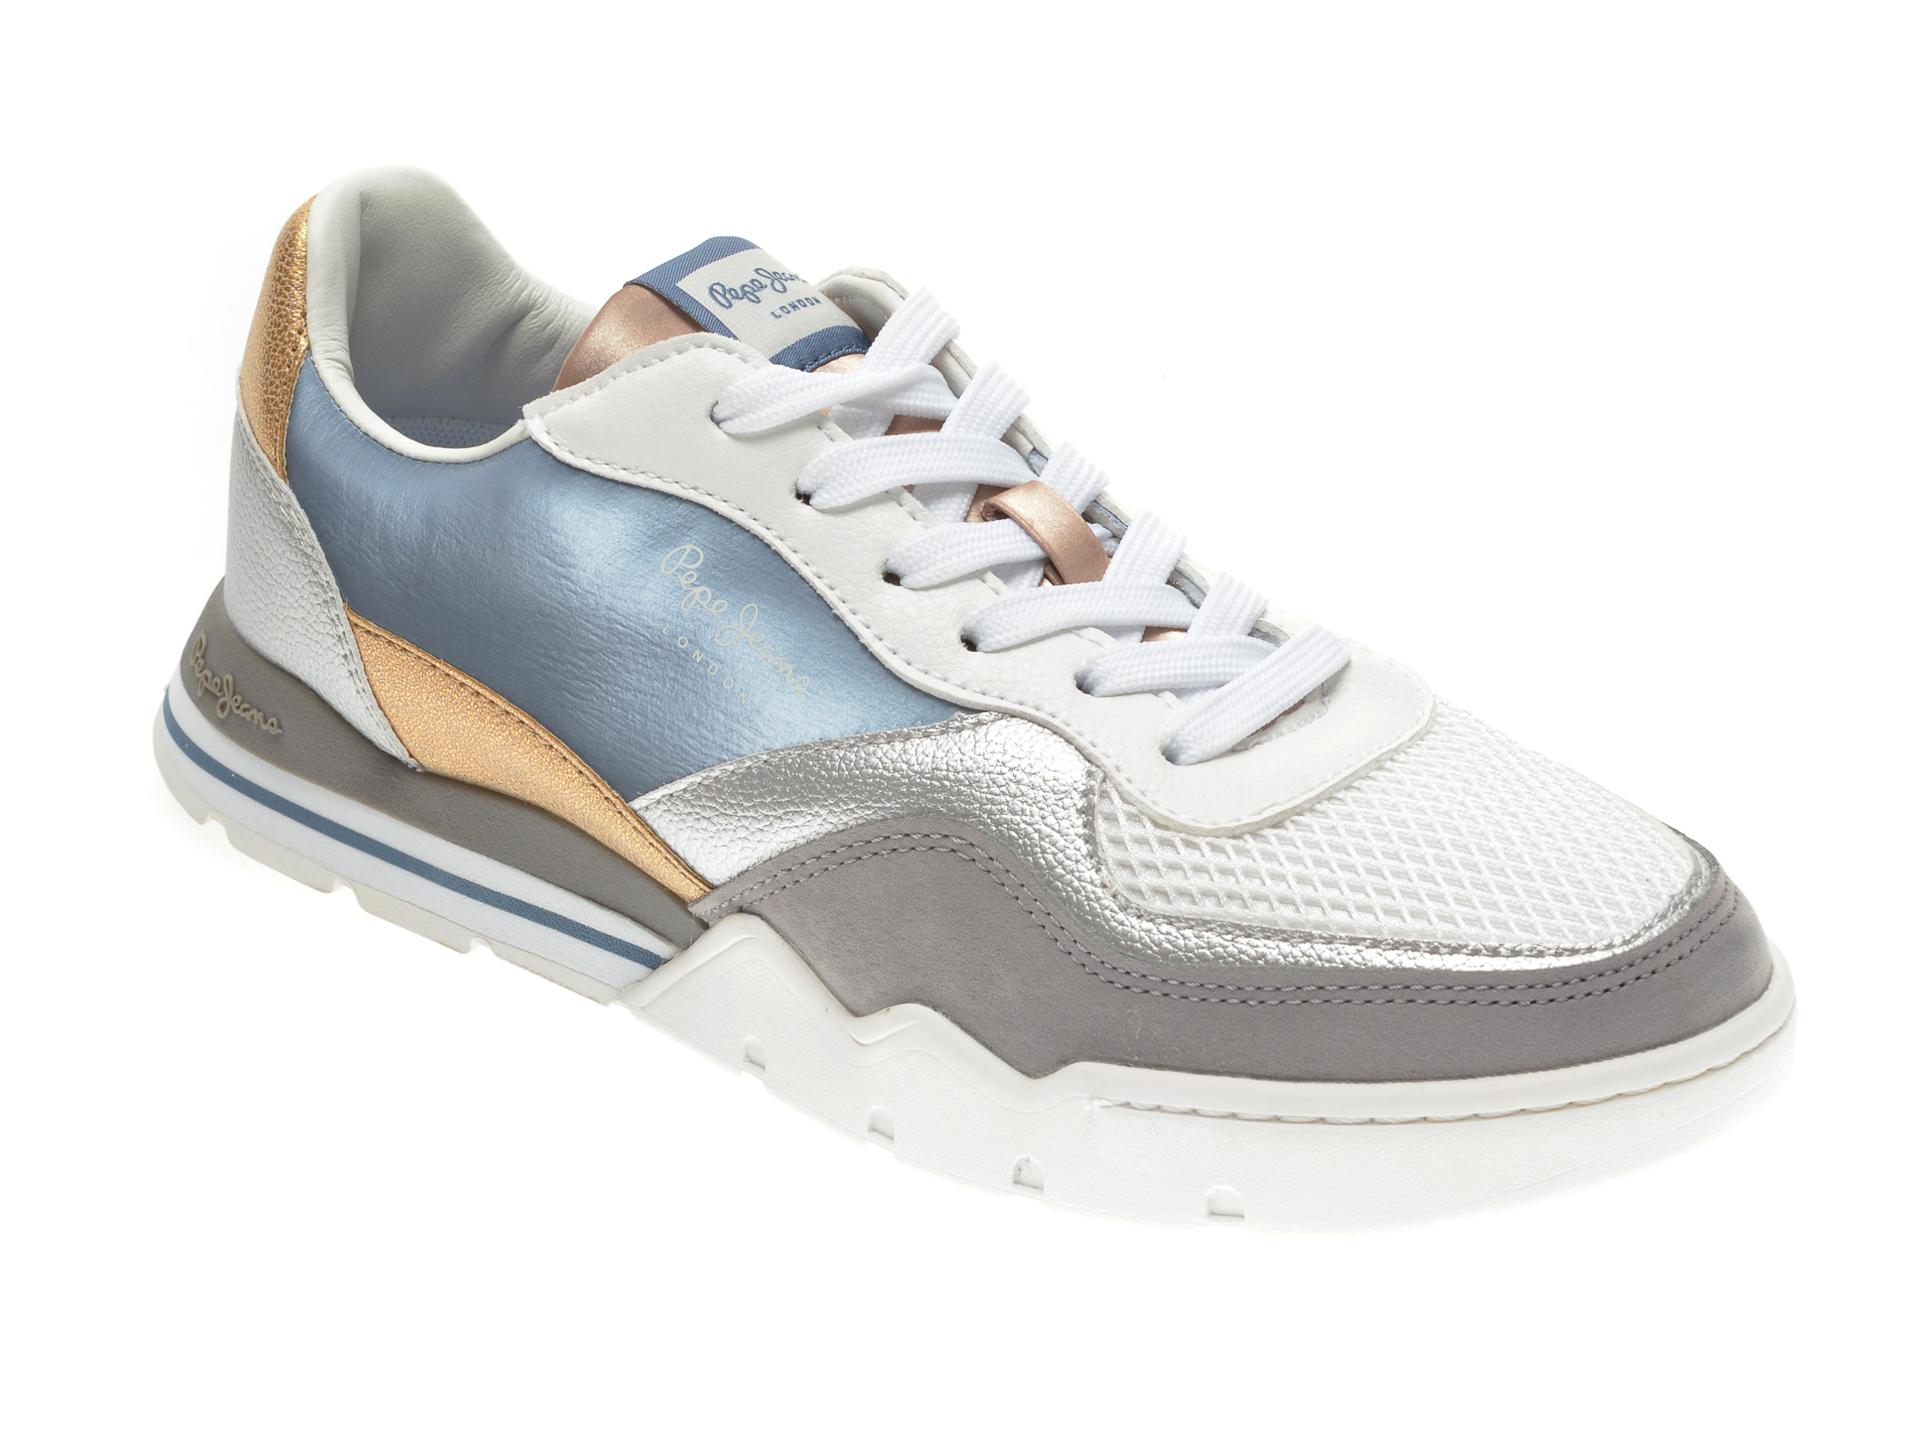 Pantofi Sport Pepe Jeans Albi, Ls31031, Din Material Textil Si Piele Ecologica